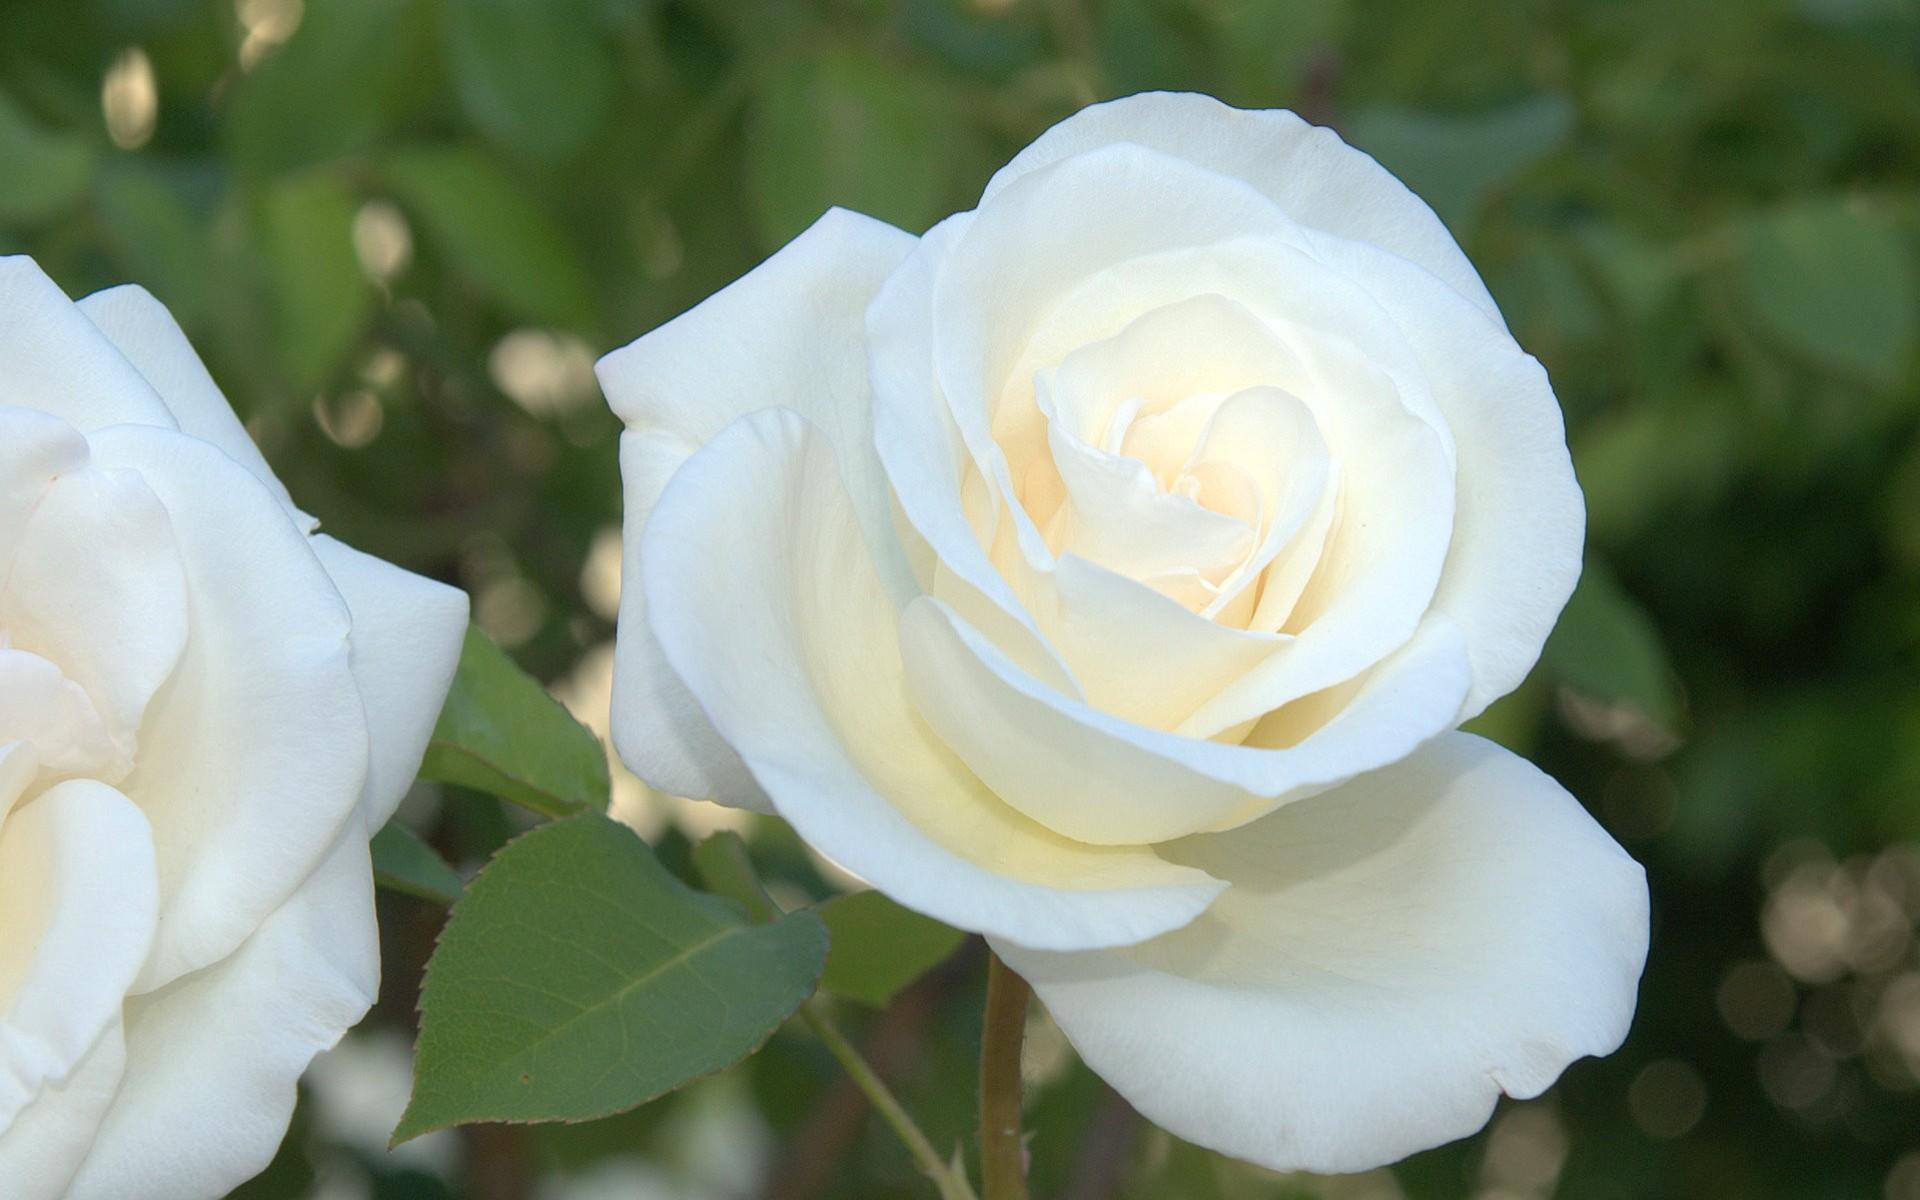 Wallpaper Resolutions - World Beautiful Rose Flowers , HD Wallpaper & Backgrounds